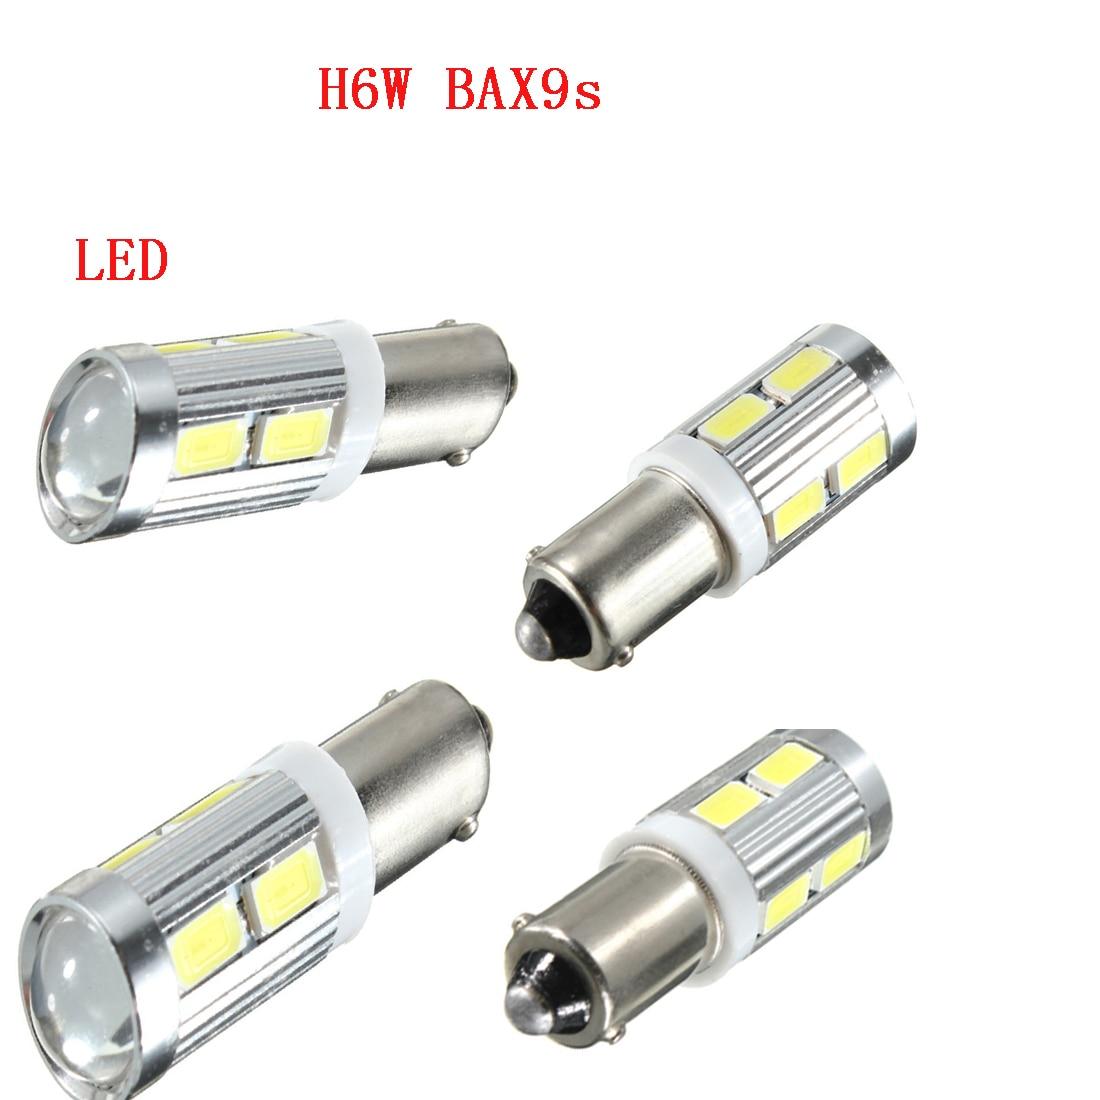 Dongzhen H6W BAX9S 433C 5630 LED SMD Super Power Fog lamp Automobiles Backup Reversing Brake Lights Parking Bulb White 2pcs